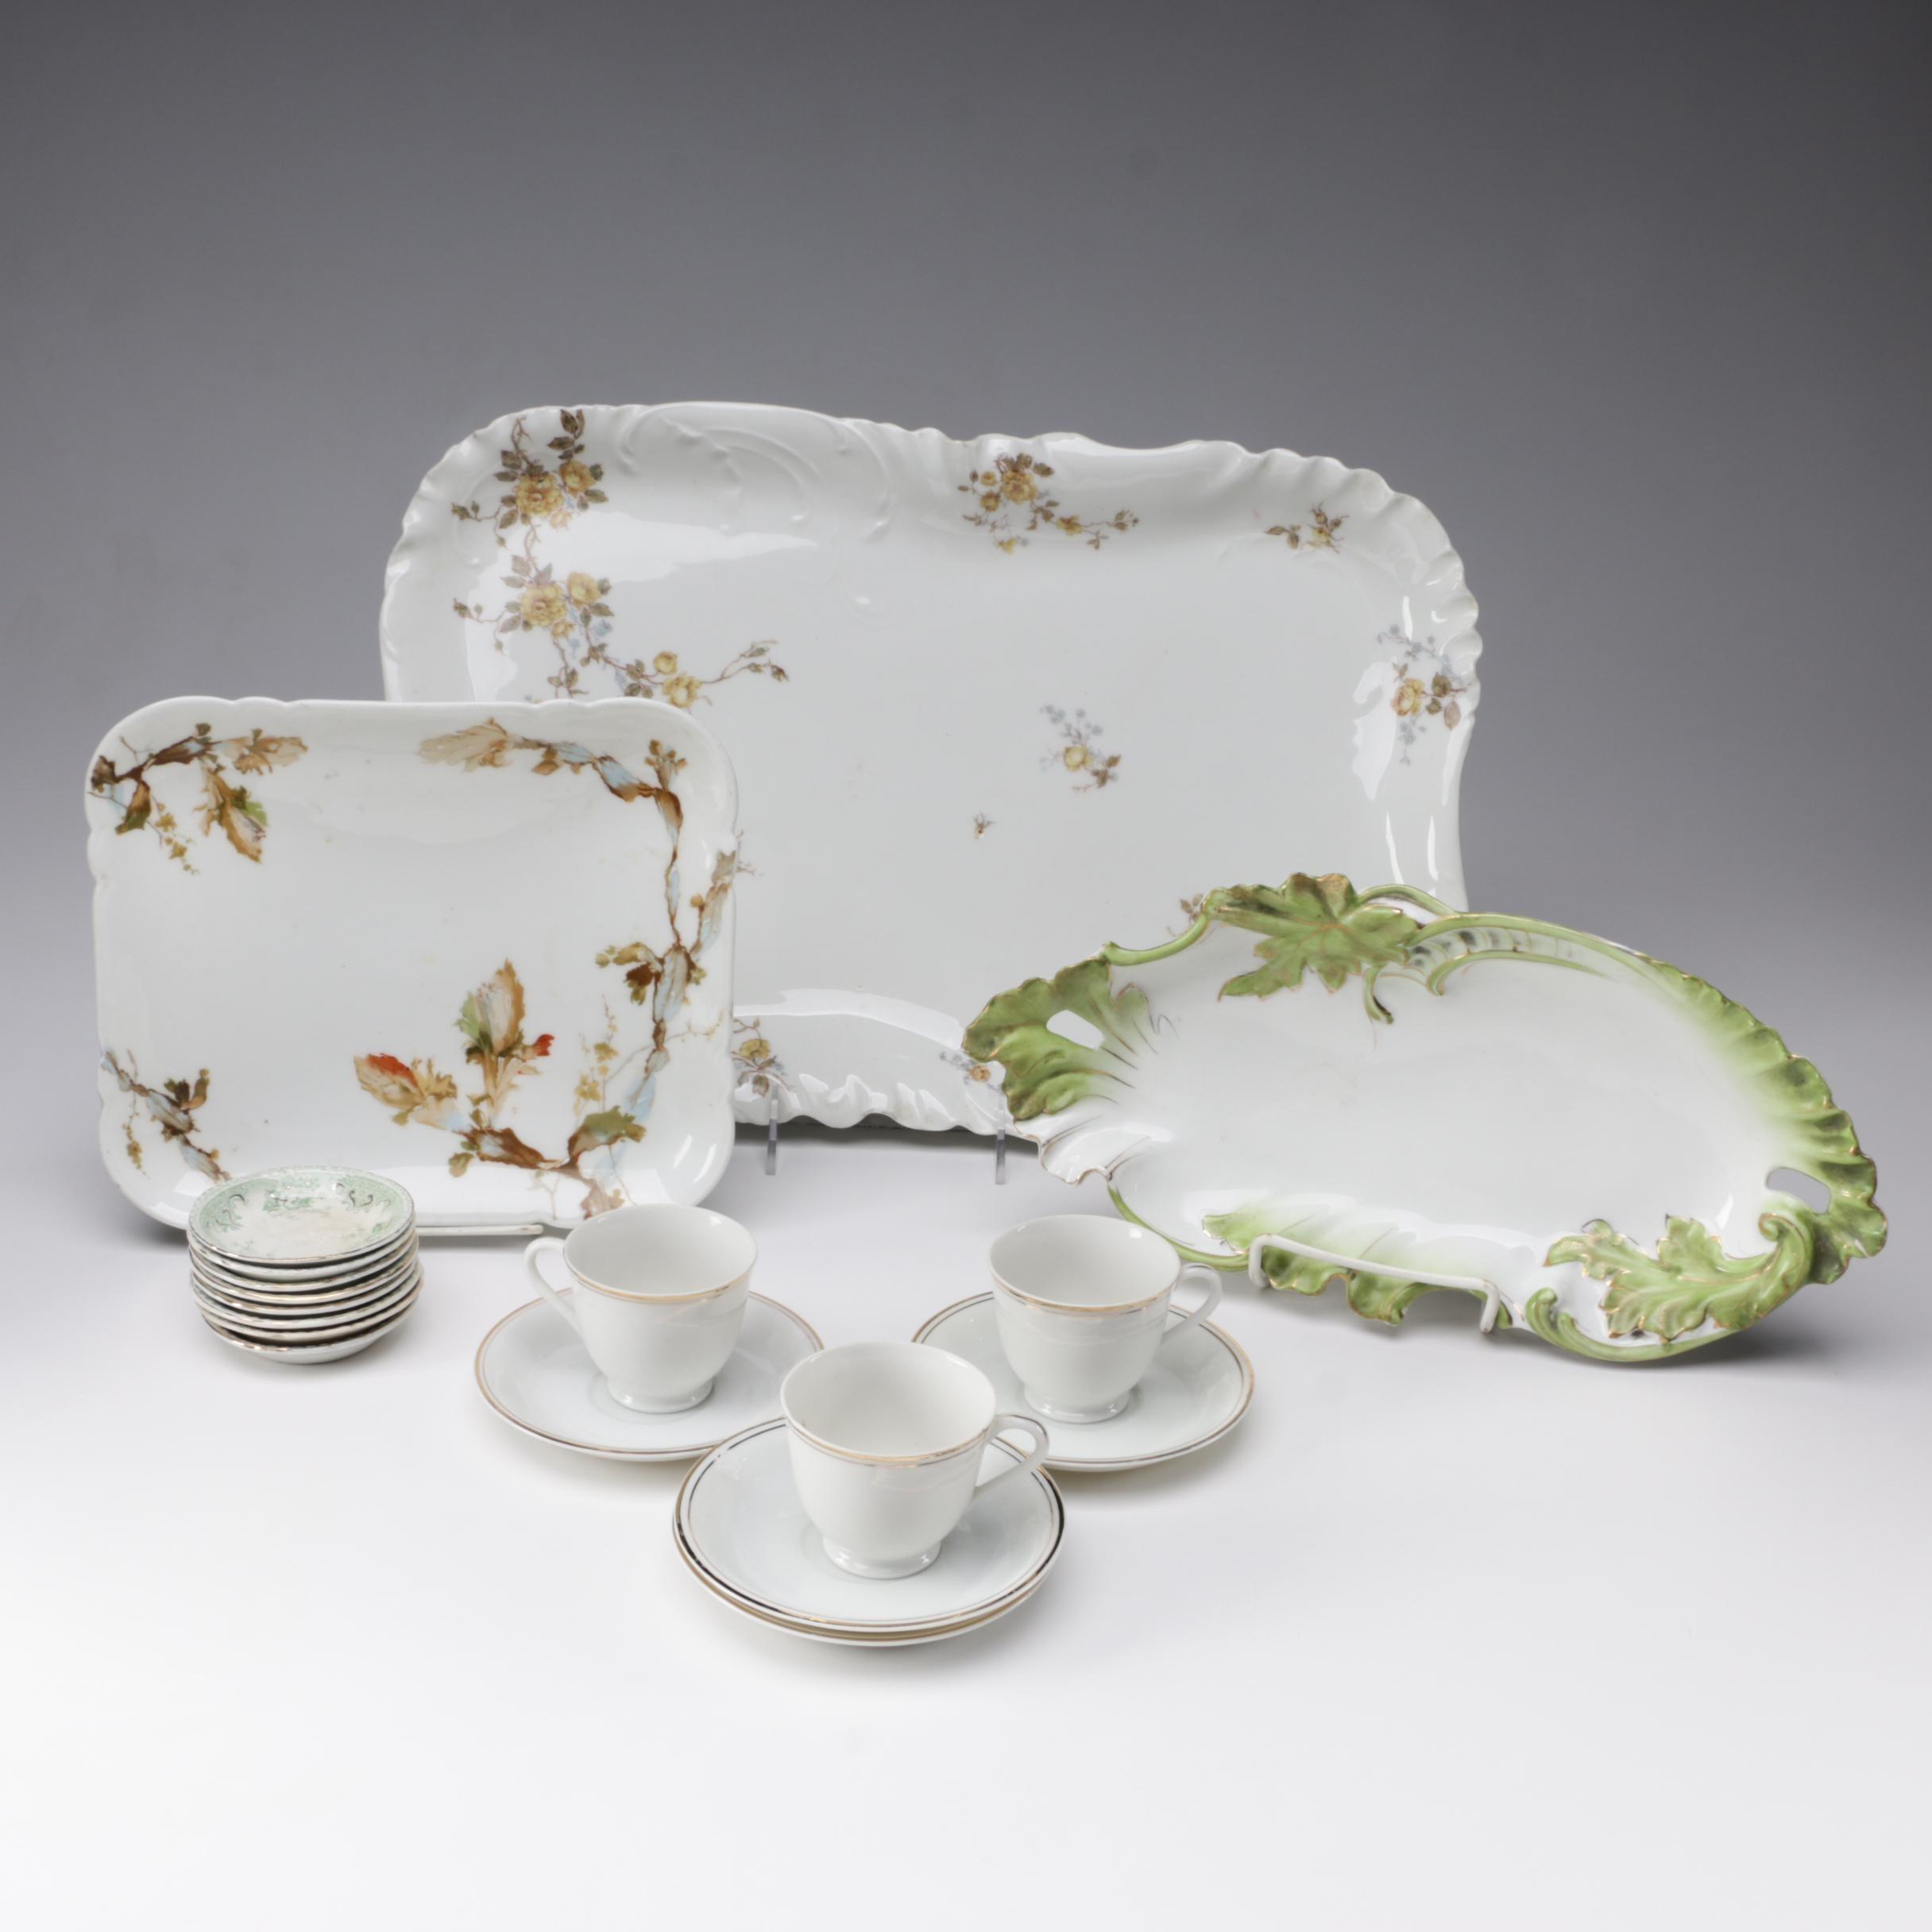 Porcelain Serveware and Demitasse Set featuring Haviland